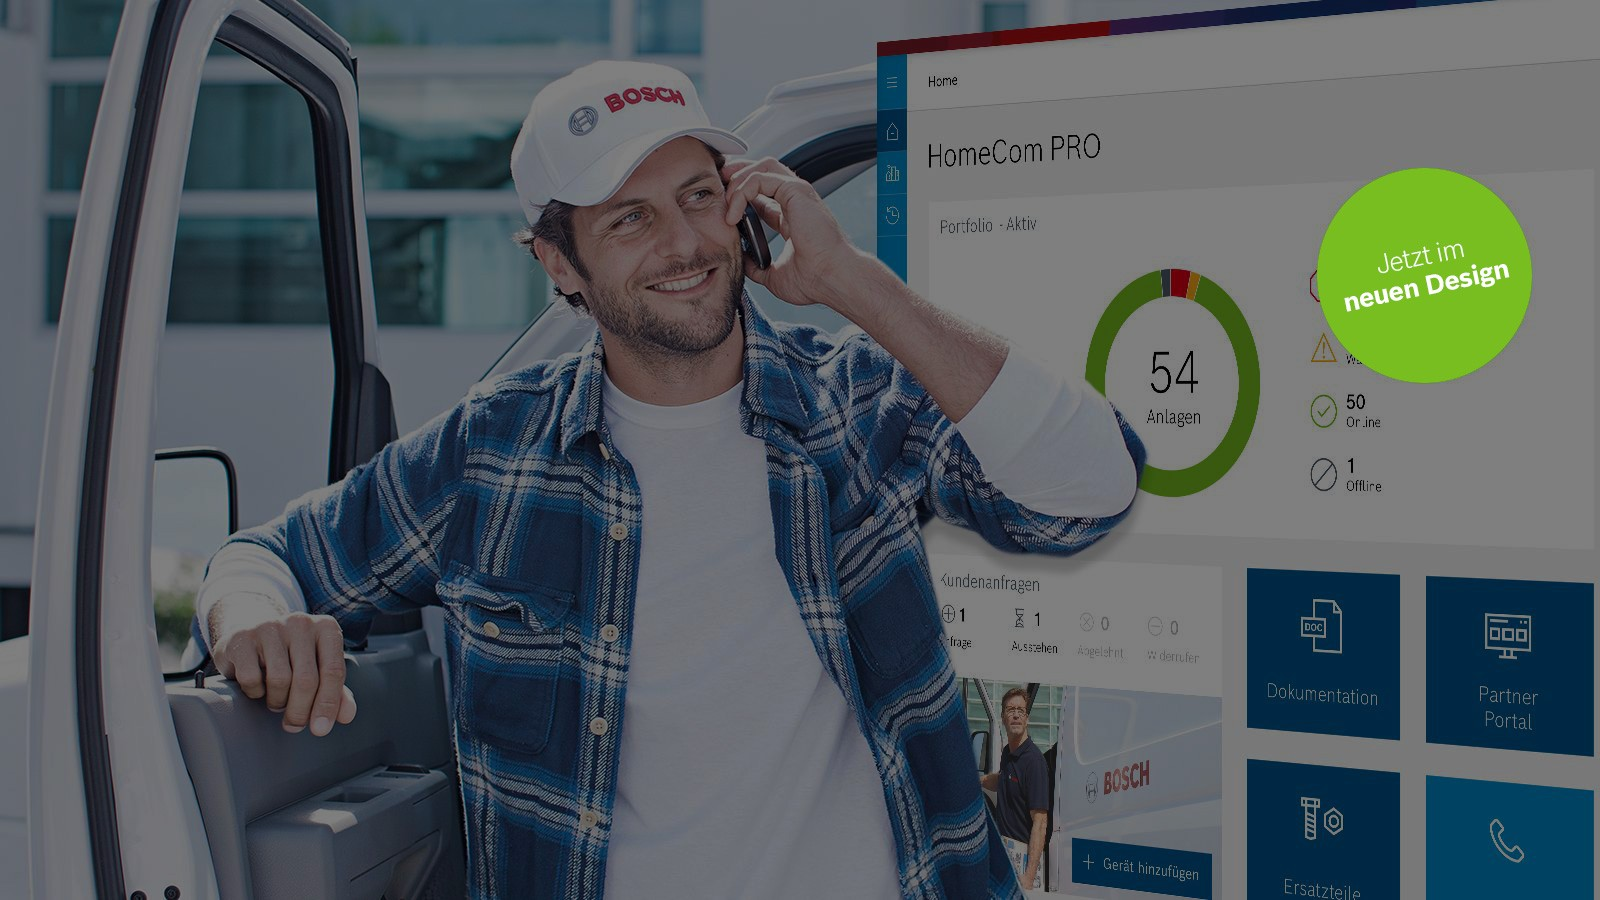 Bosch HomeCom Pro